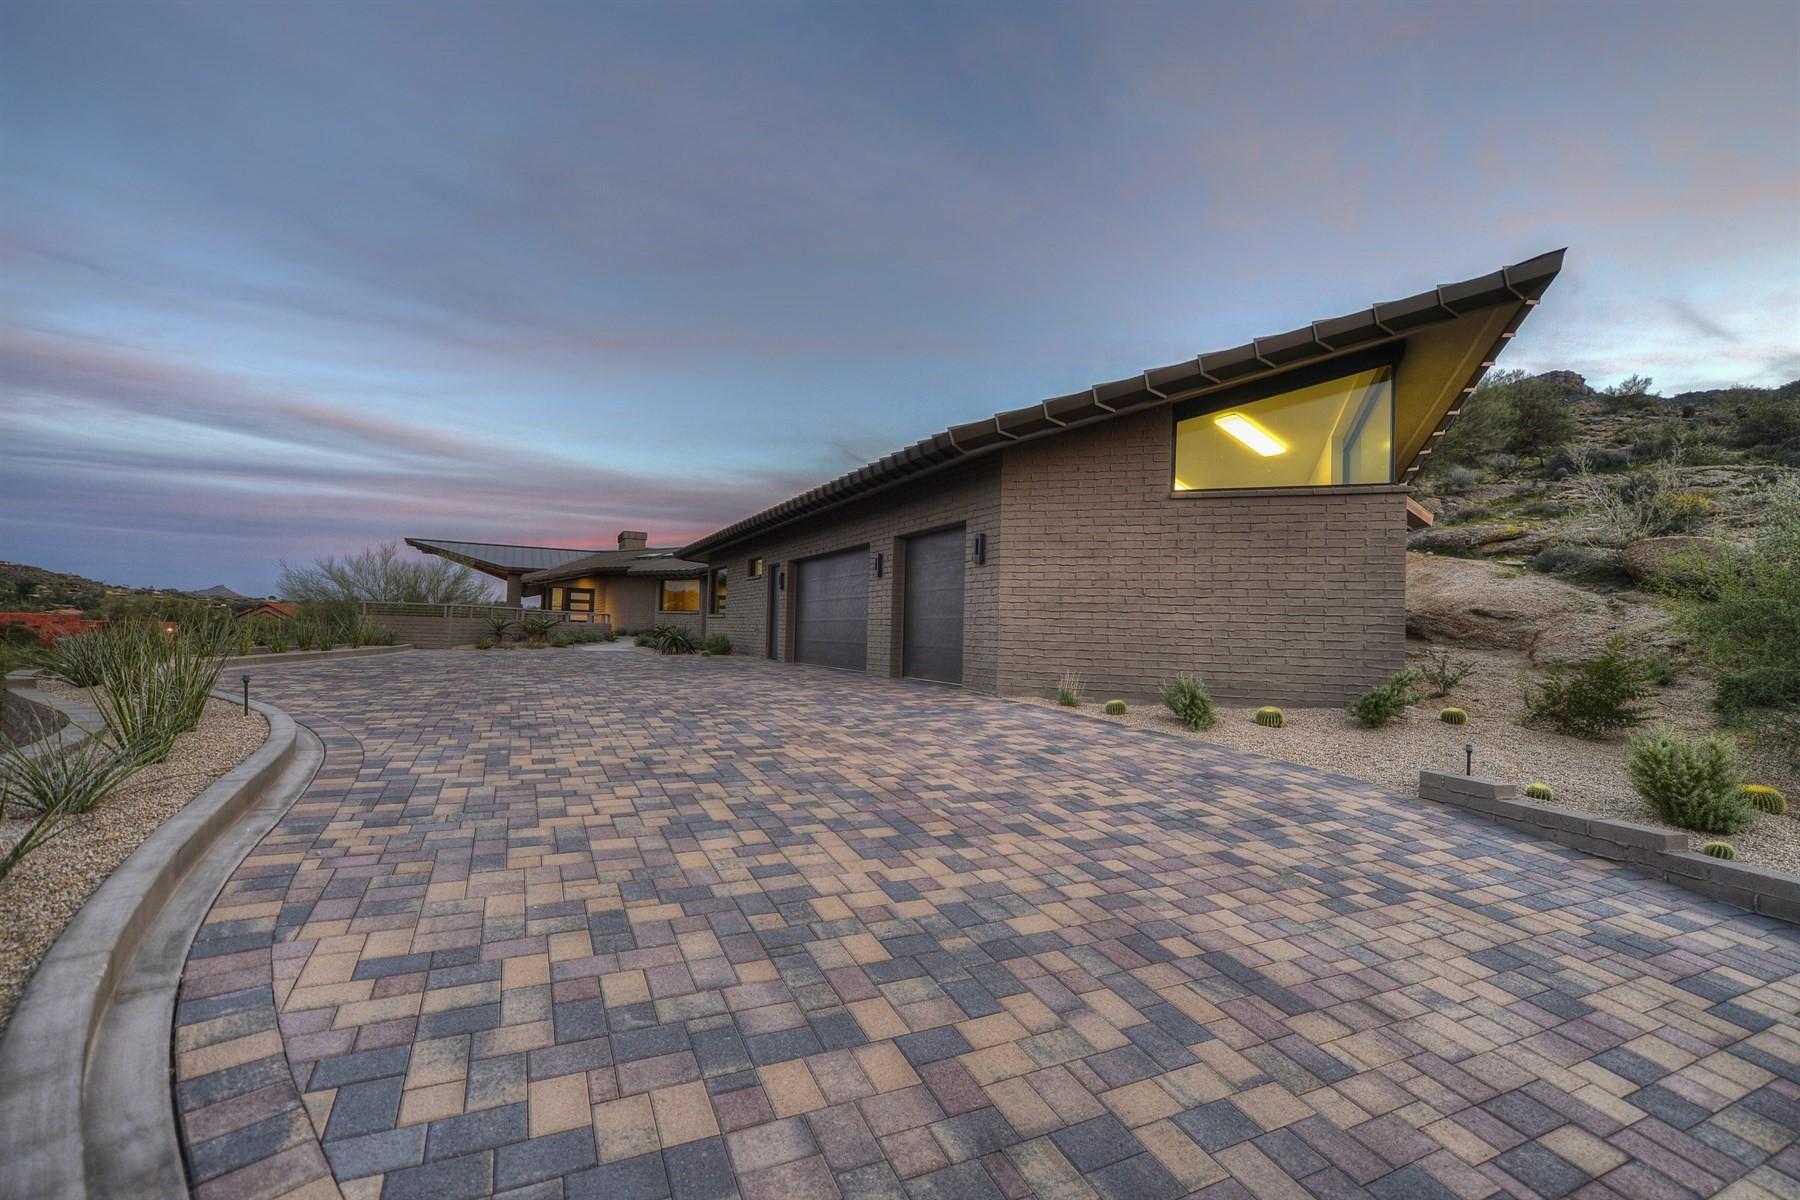 Single Family Homes for Active at Nighthawk on Black Mtn 37251 Nighthawk Way Carefree, Arizona 85377 United States